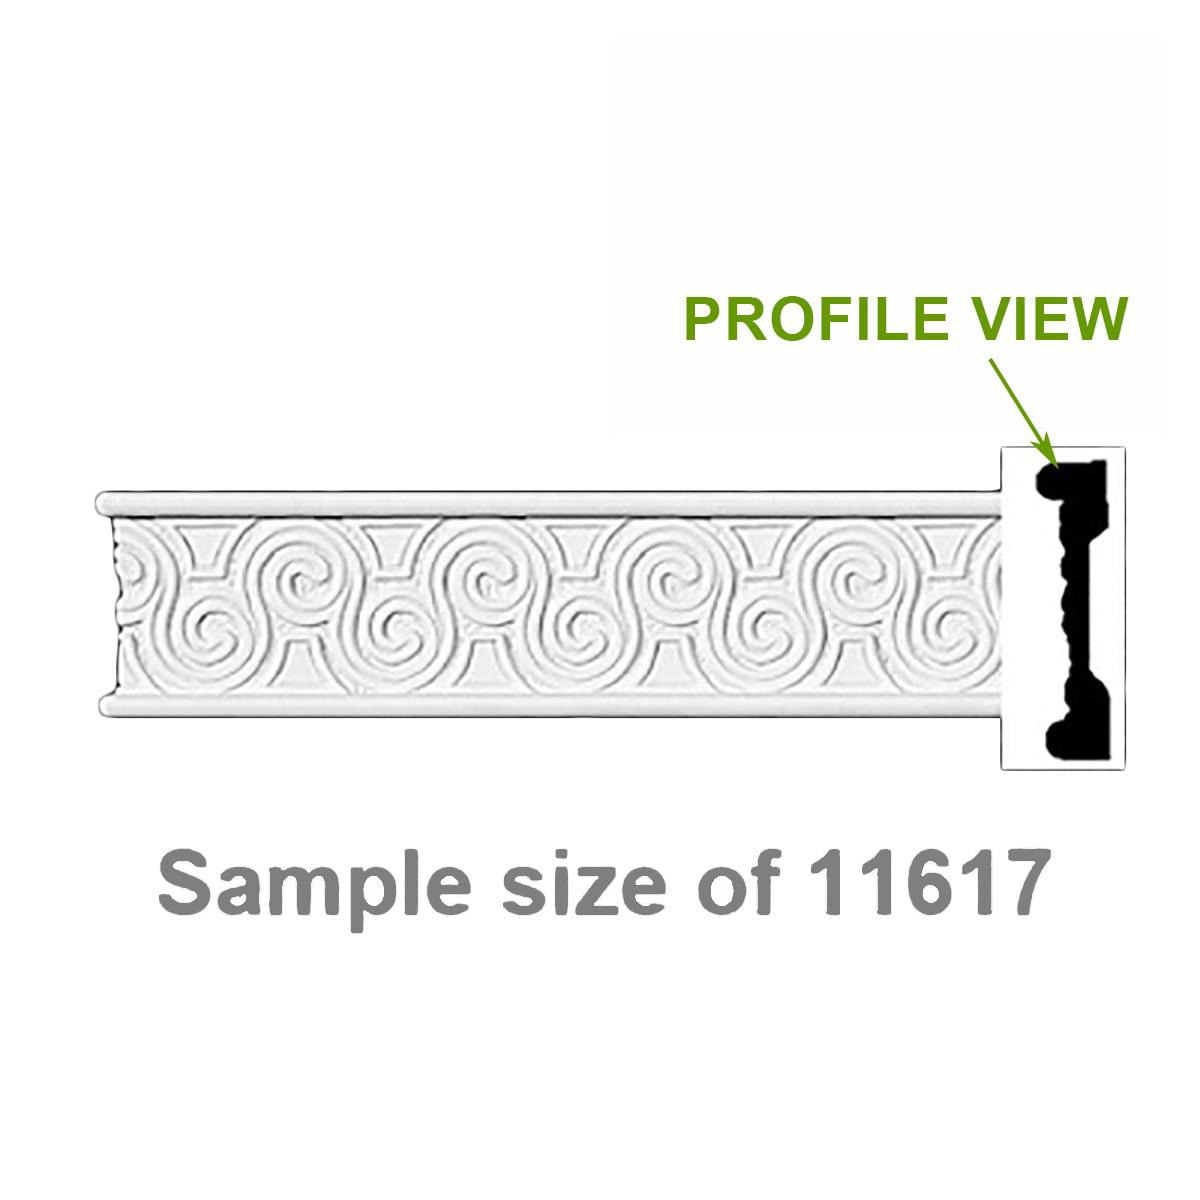 Cornice White Urethane Sample of 11617 | Renovator's Supply